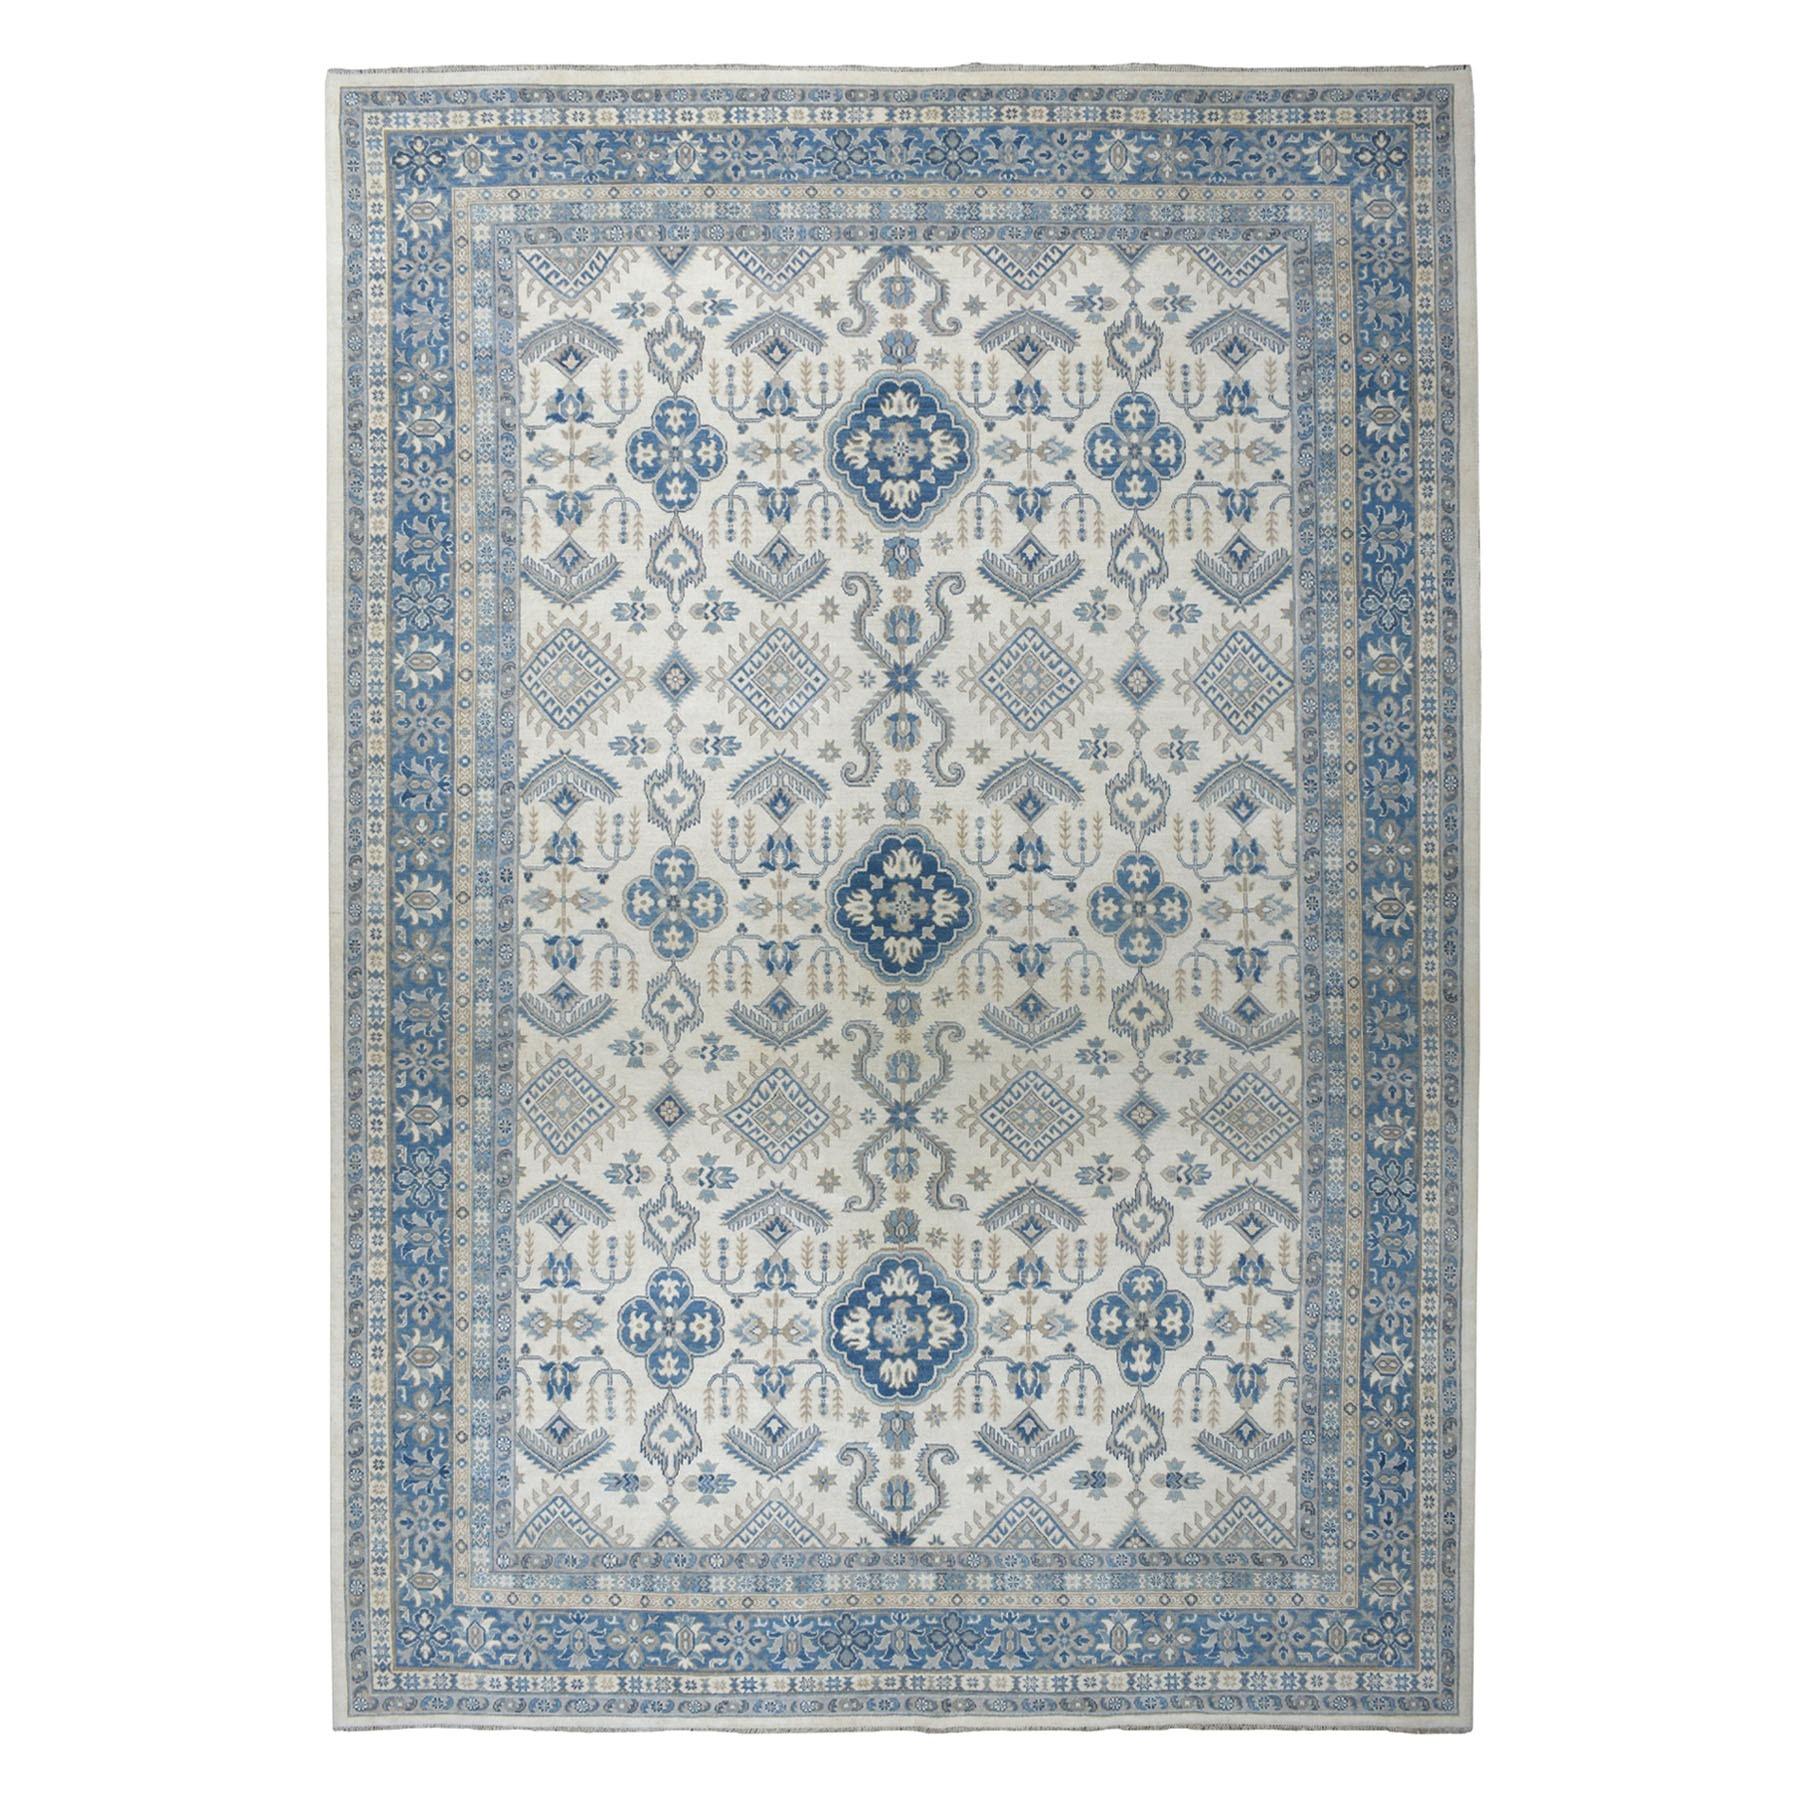 "10'X13'8"" Ivory Vintage Look Kazak Geometric Design Pure Wool Hand-Knotted Oriental Rug moaeaddd"